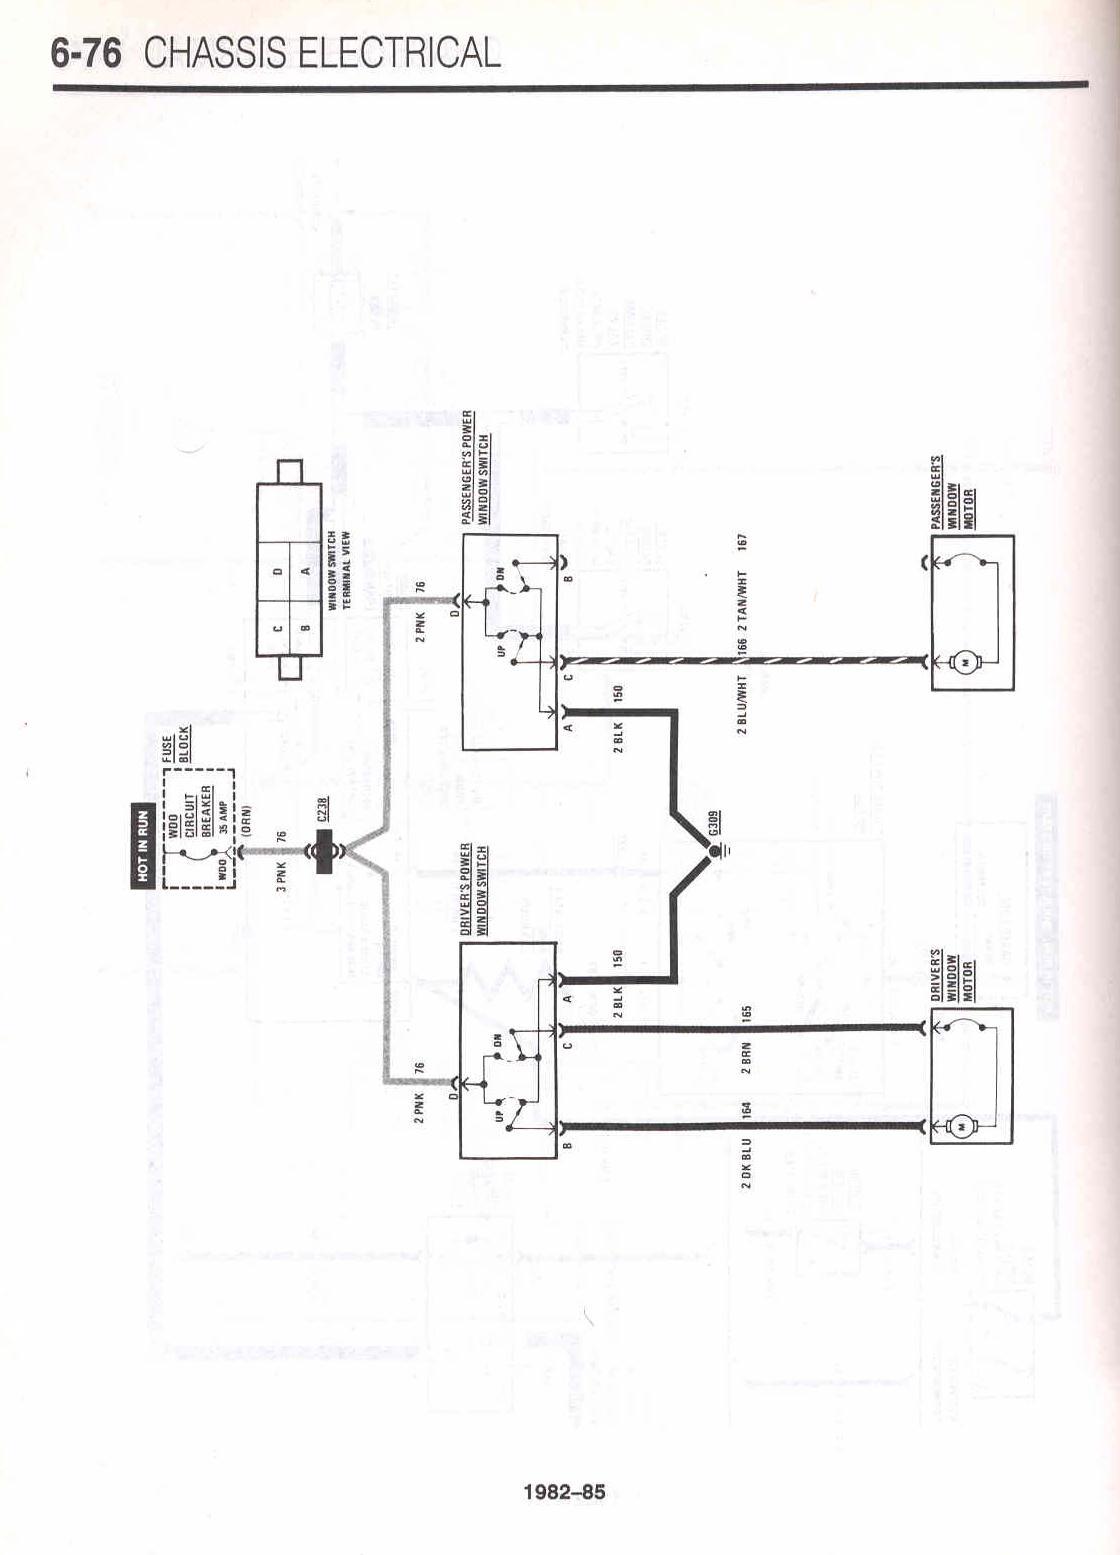 Car Info  Nova Wiring Diagram on 62 nova exhaust, 63 chevy wiring diagram, 1969 chevelle wiring diagram, 62 nova dimensions, 1966 impala wiring diagram, 69 camaro wiring diagram, 1964 impala wiring diagram, 1972 chevelle wiring diagram, 1968 chevelle dash wiring diagram, 1968 camaro wiring harness diagram, 1968 chevy chevelle wiring diagram, 62 nova electrical system, 67 impala wiring diagram, 68 chevelle wiring diagram, 80 camaro wiring diagram, 1968 chevy impala wiring diagram, 62 nova chassis, 62 nova parts, 66 impala wiring diagram, 93 mustang wiring diagram,